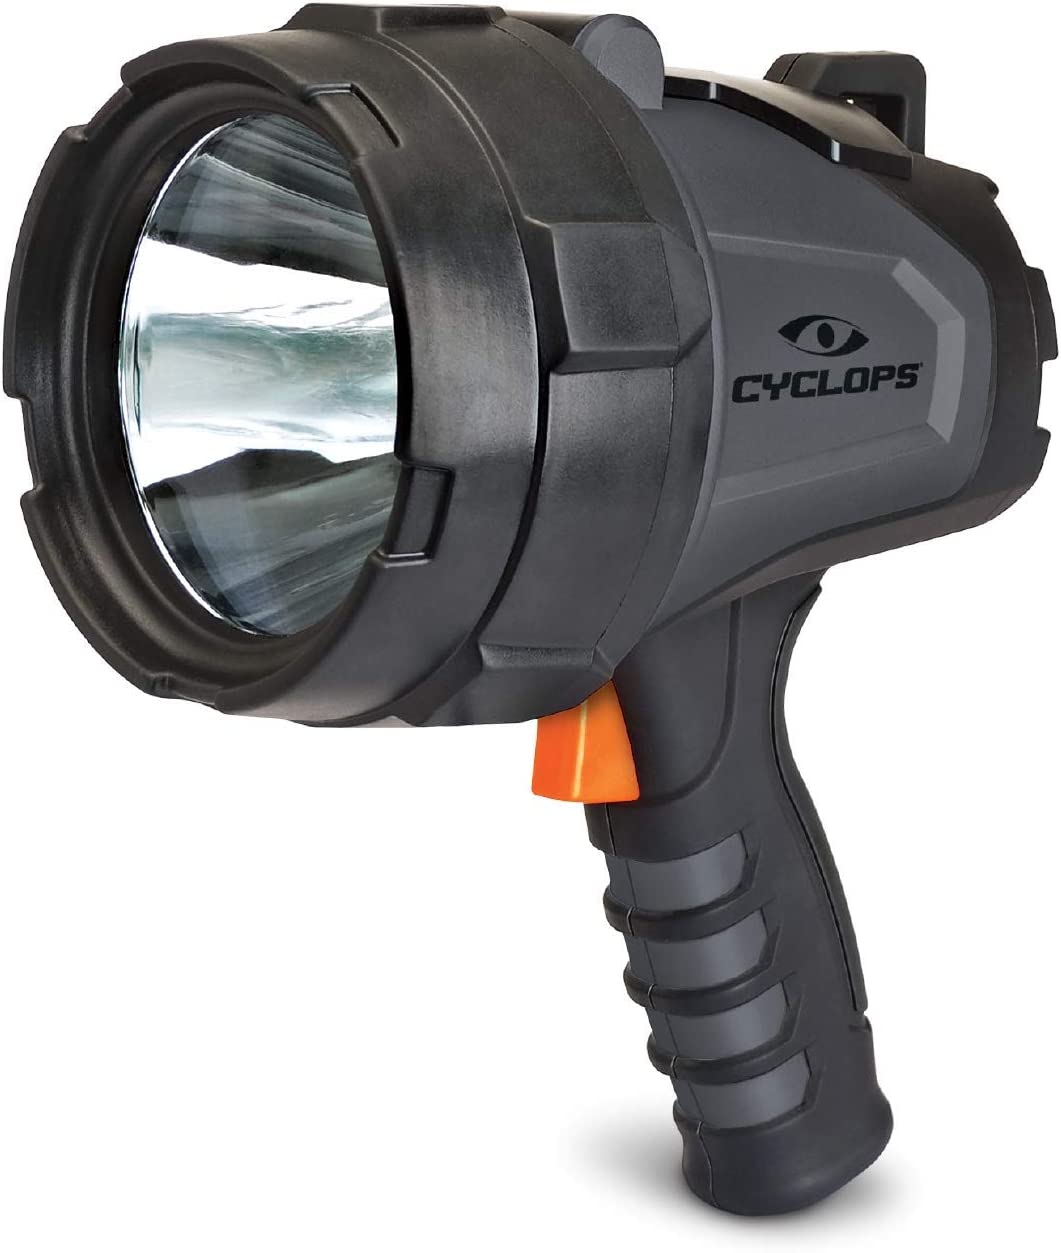 Cyclops 900 Lum 10 Watt Mail order Regular store Led Multi Spotlight Size One